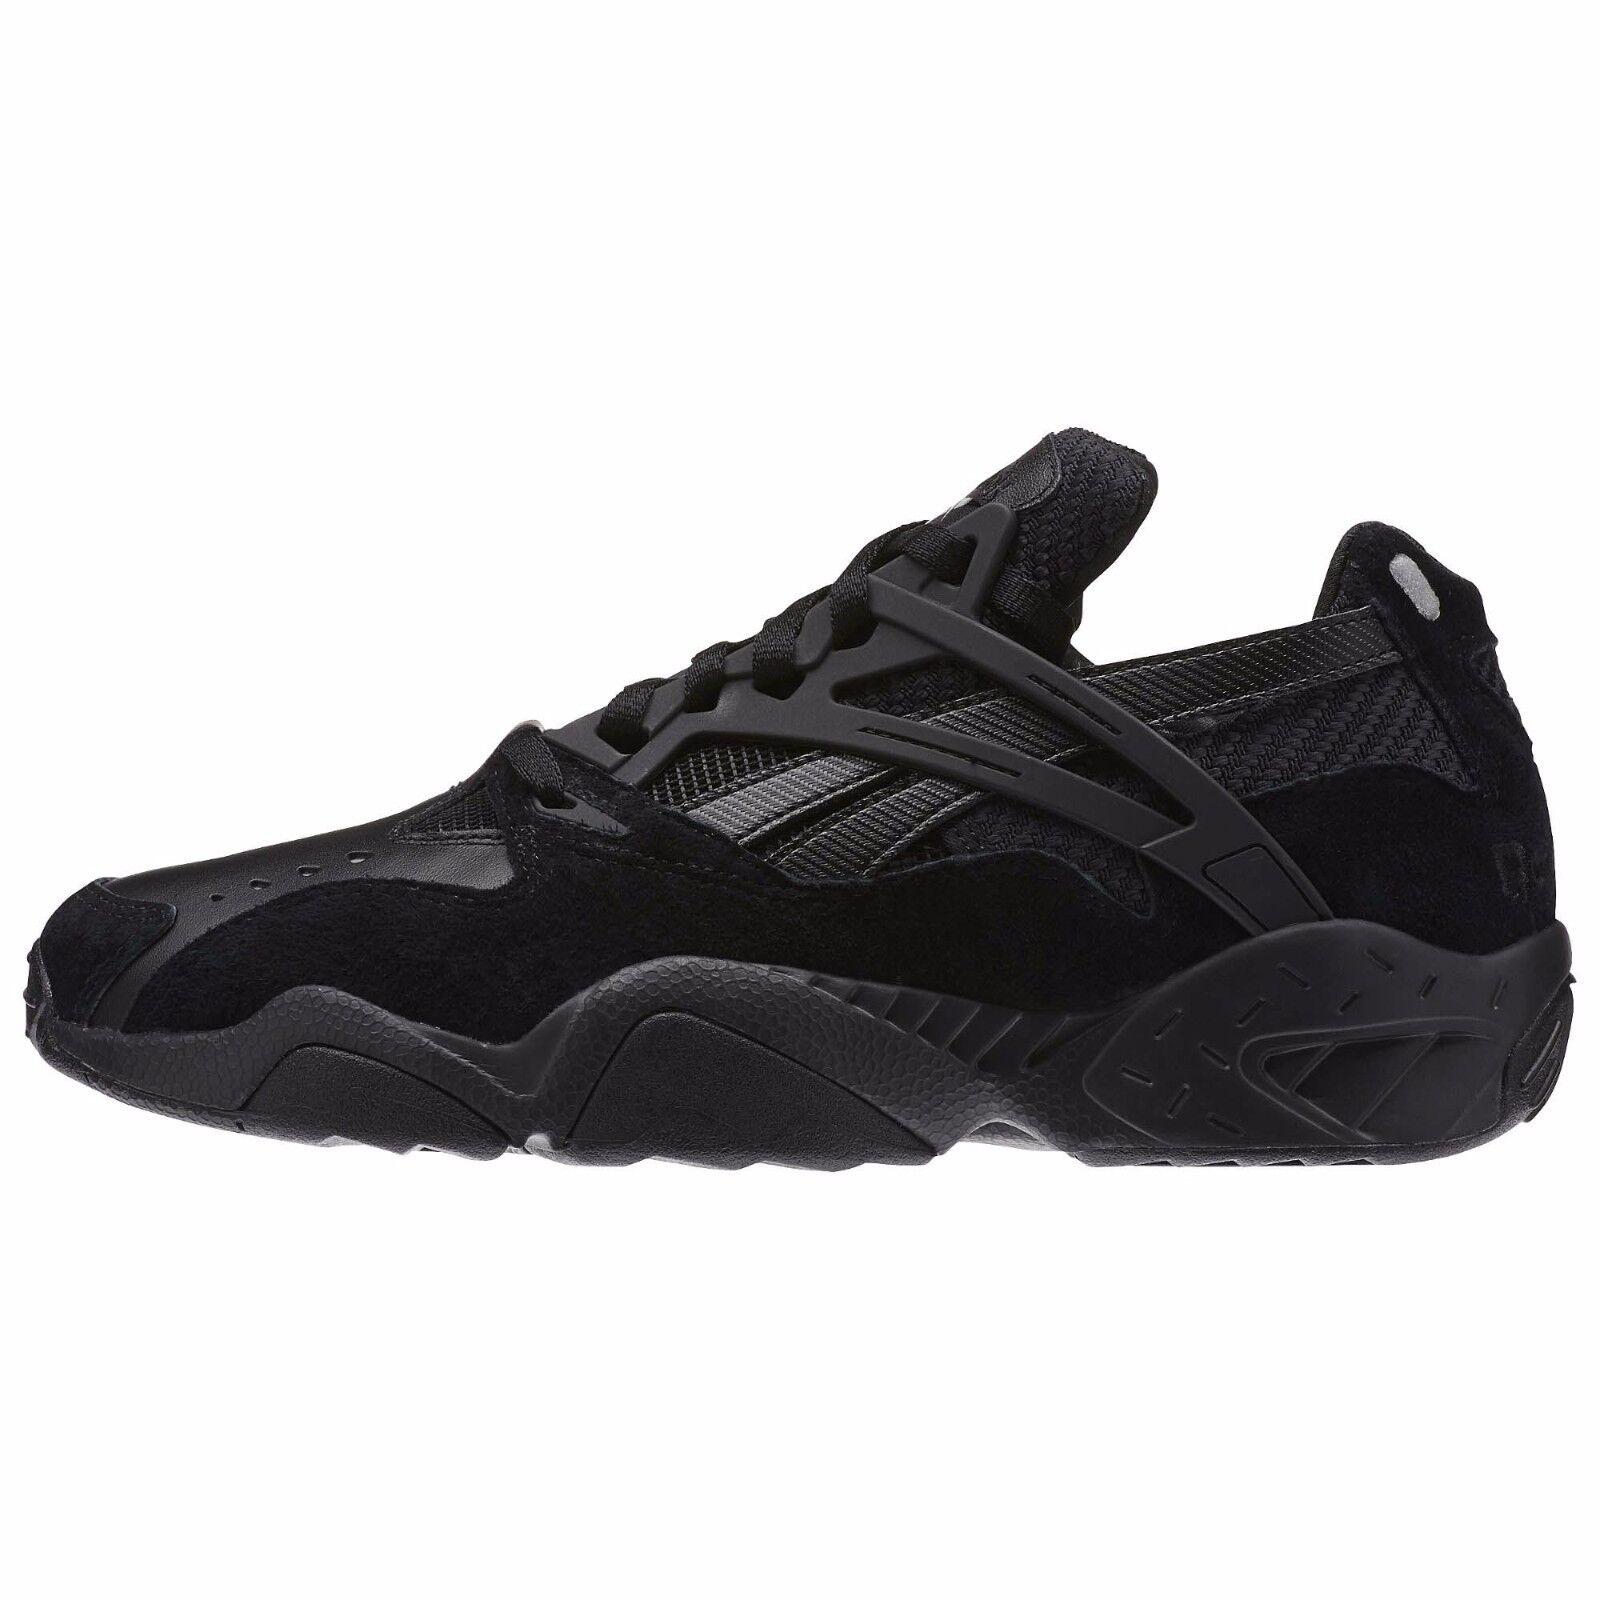 Reebok Men's Sneakers US 9.5  Graphlite Pro Solids  AR1336 New